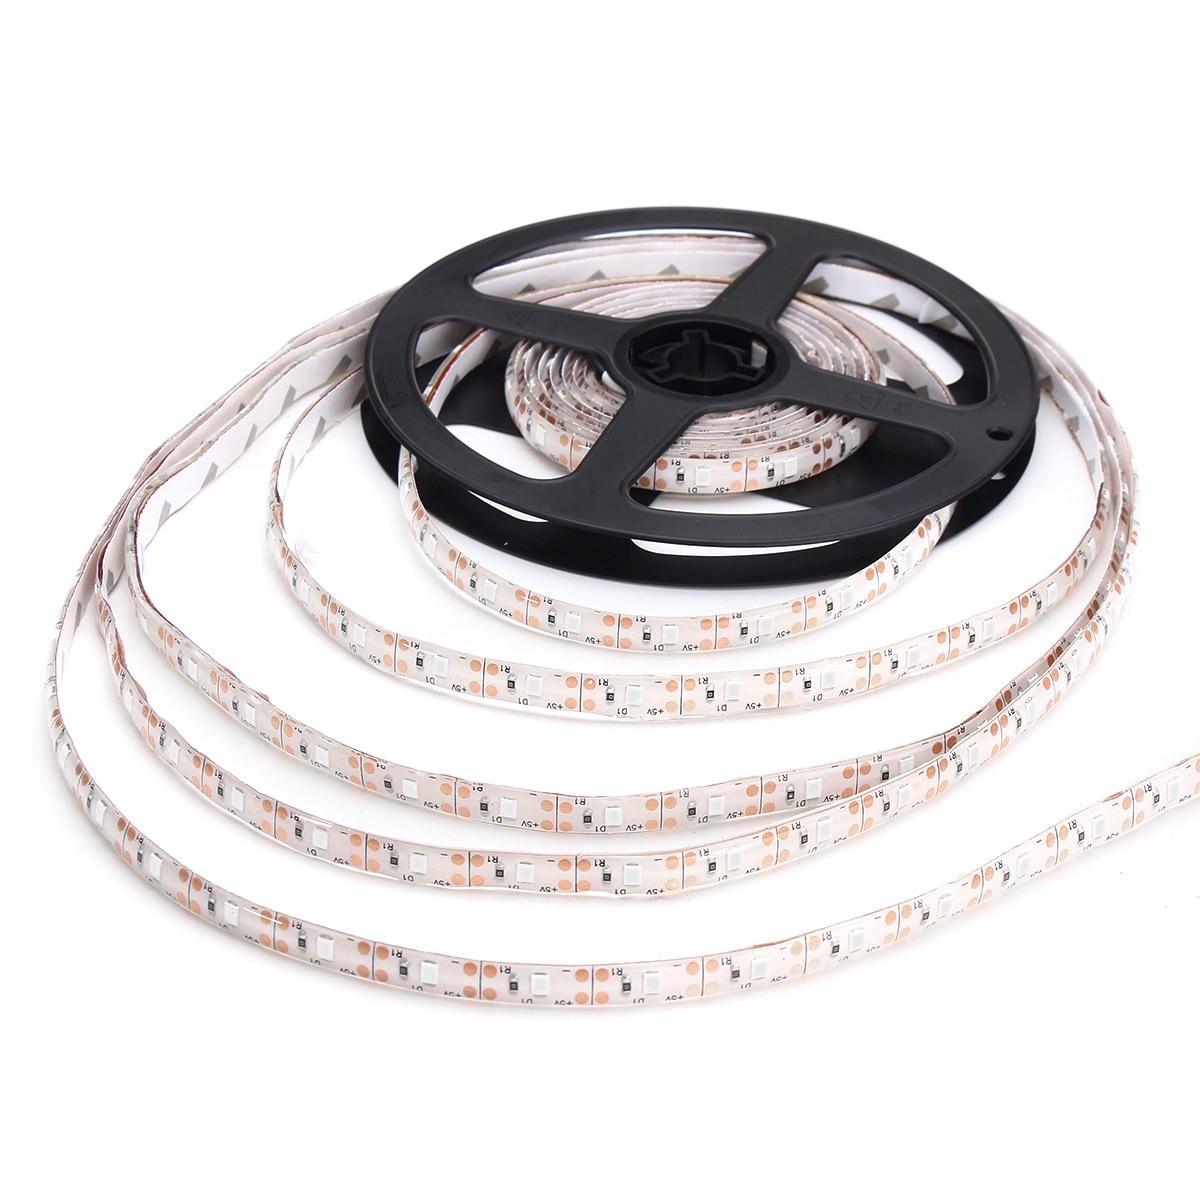 Smuxi USB LED Strip 2835 LED Lights 12V Flexible Home Decoration Lighting 4/5M LED Tape RGB/White/Warm White/Blue/Red